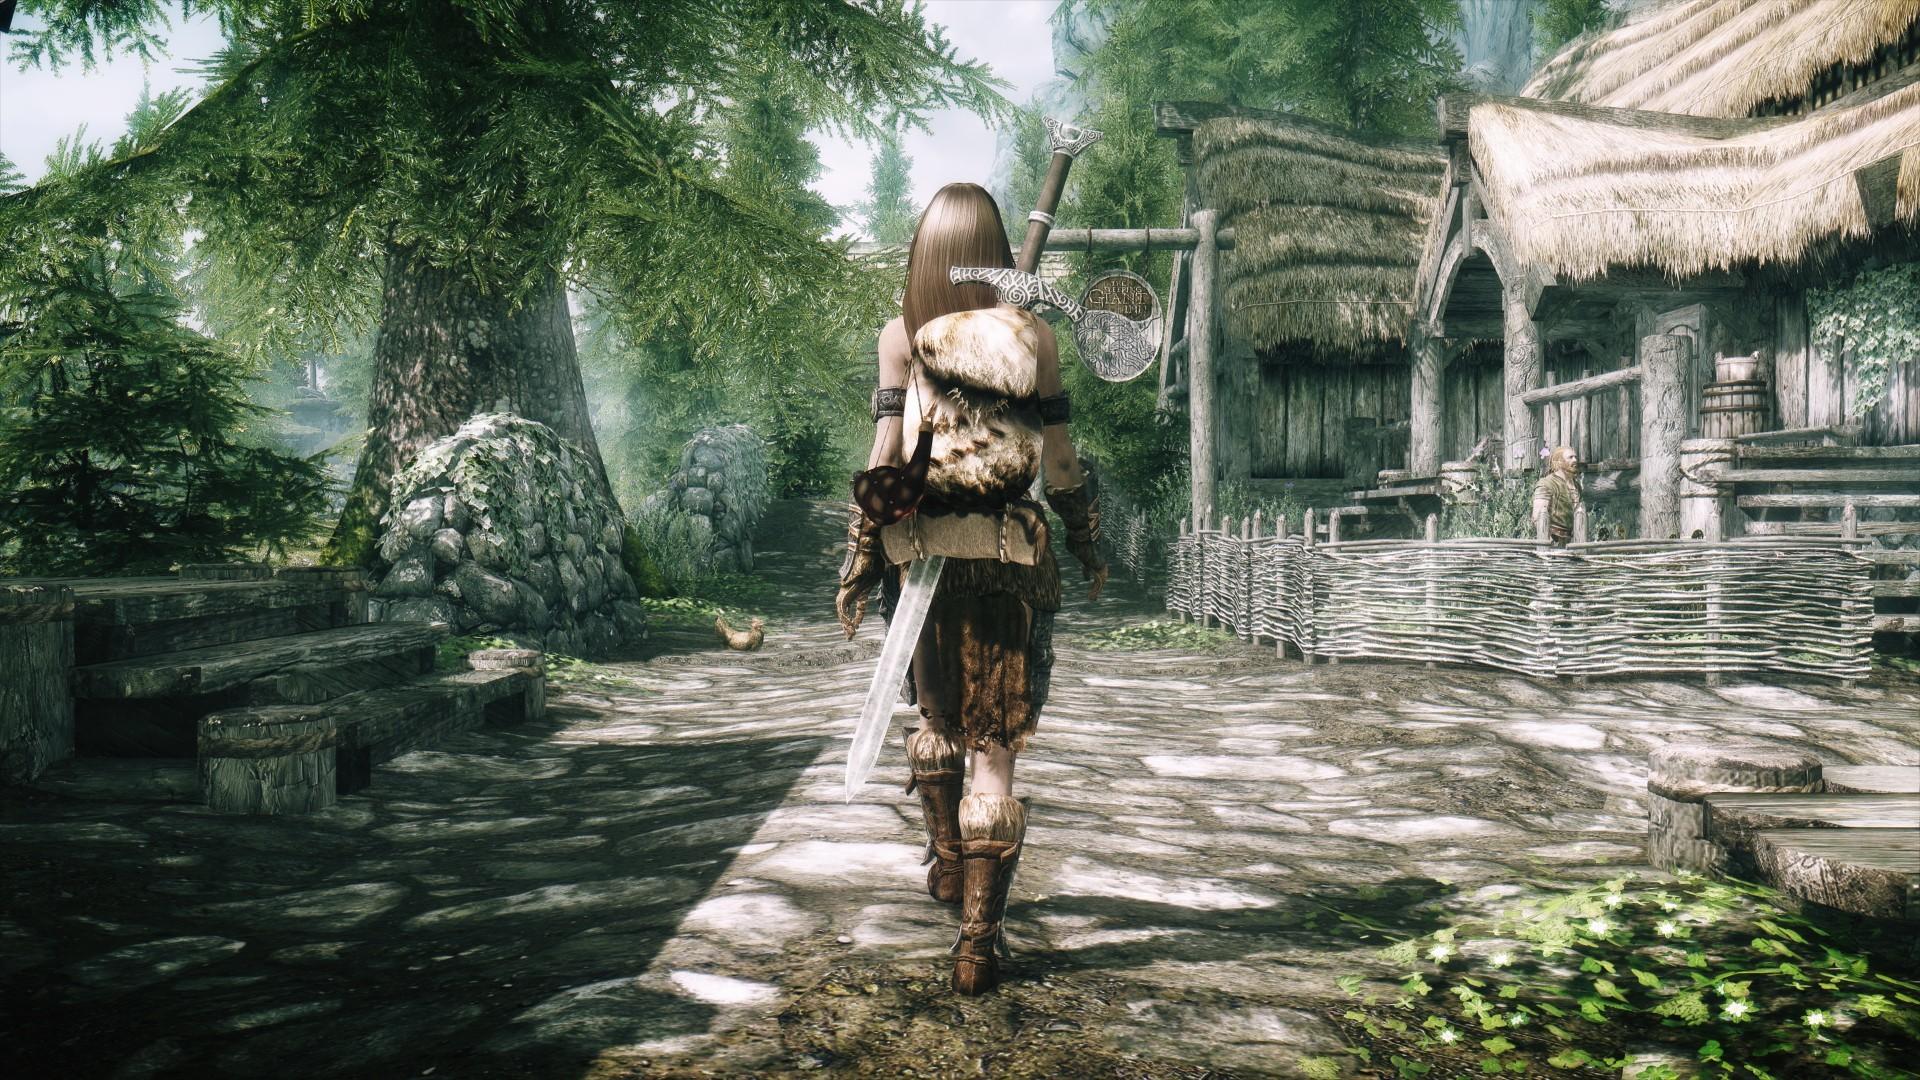 The Elder Scrolls V: Skyrim Artwork desktop PC and Mac wallpaper